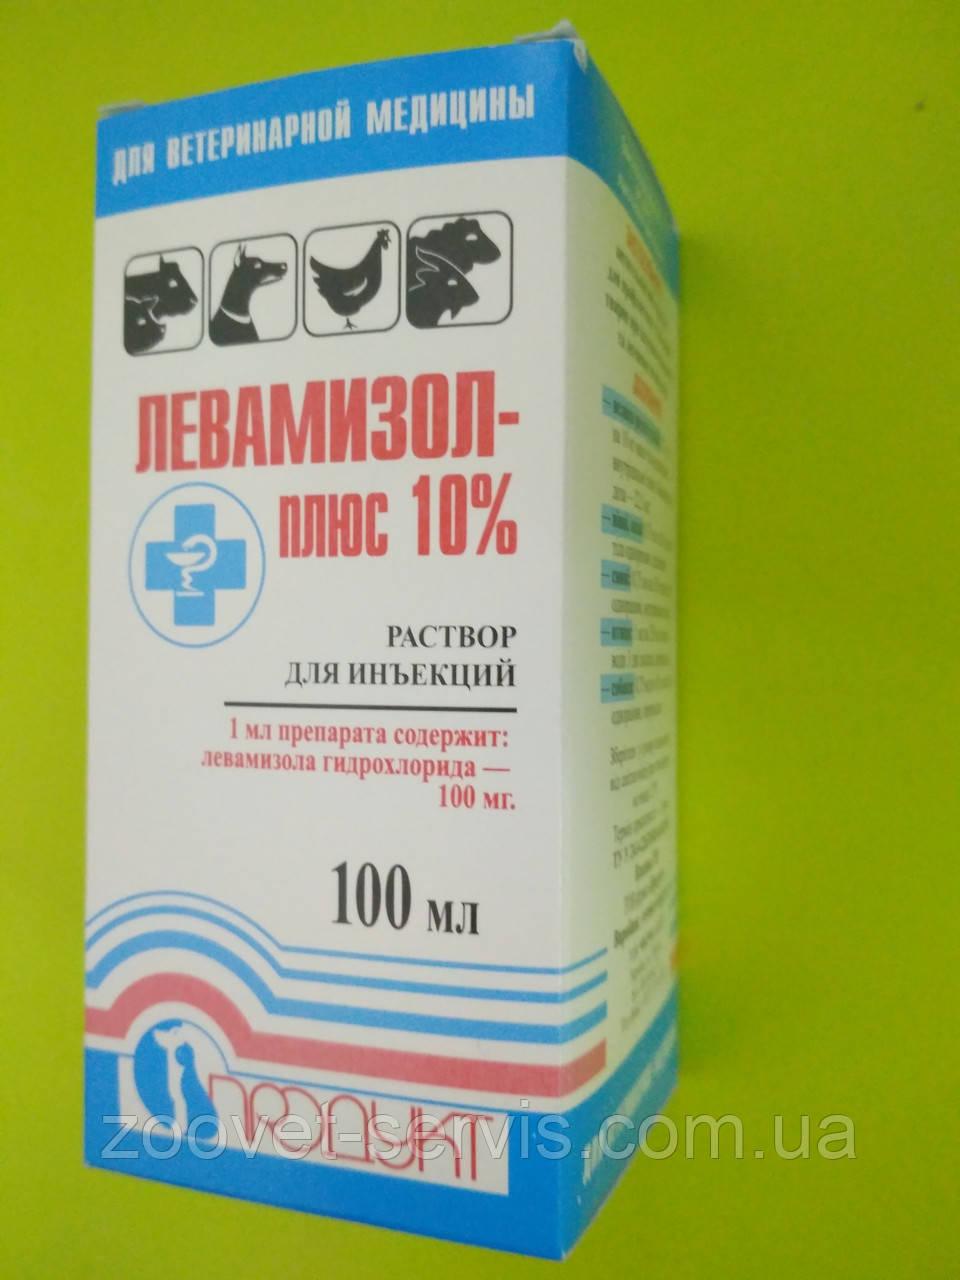 Левамизол-ПЛЮС 10% 100 мл